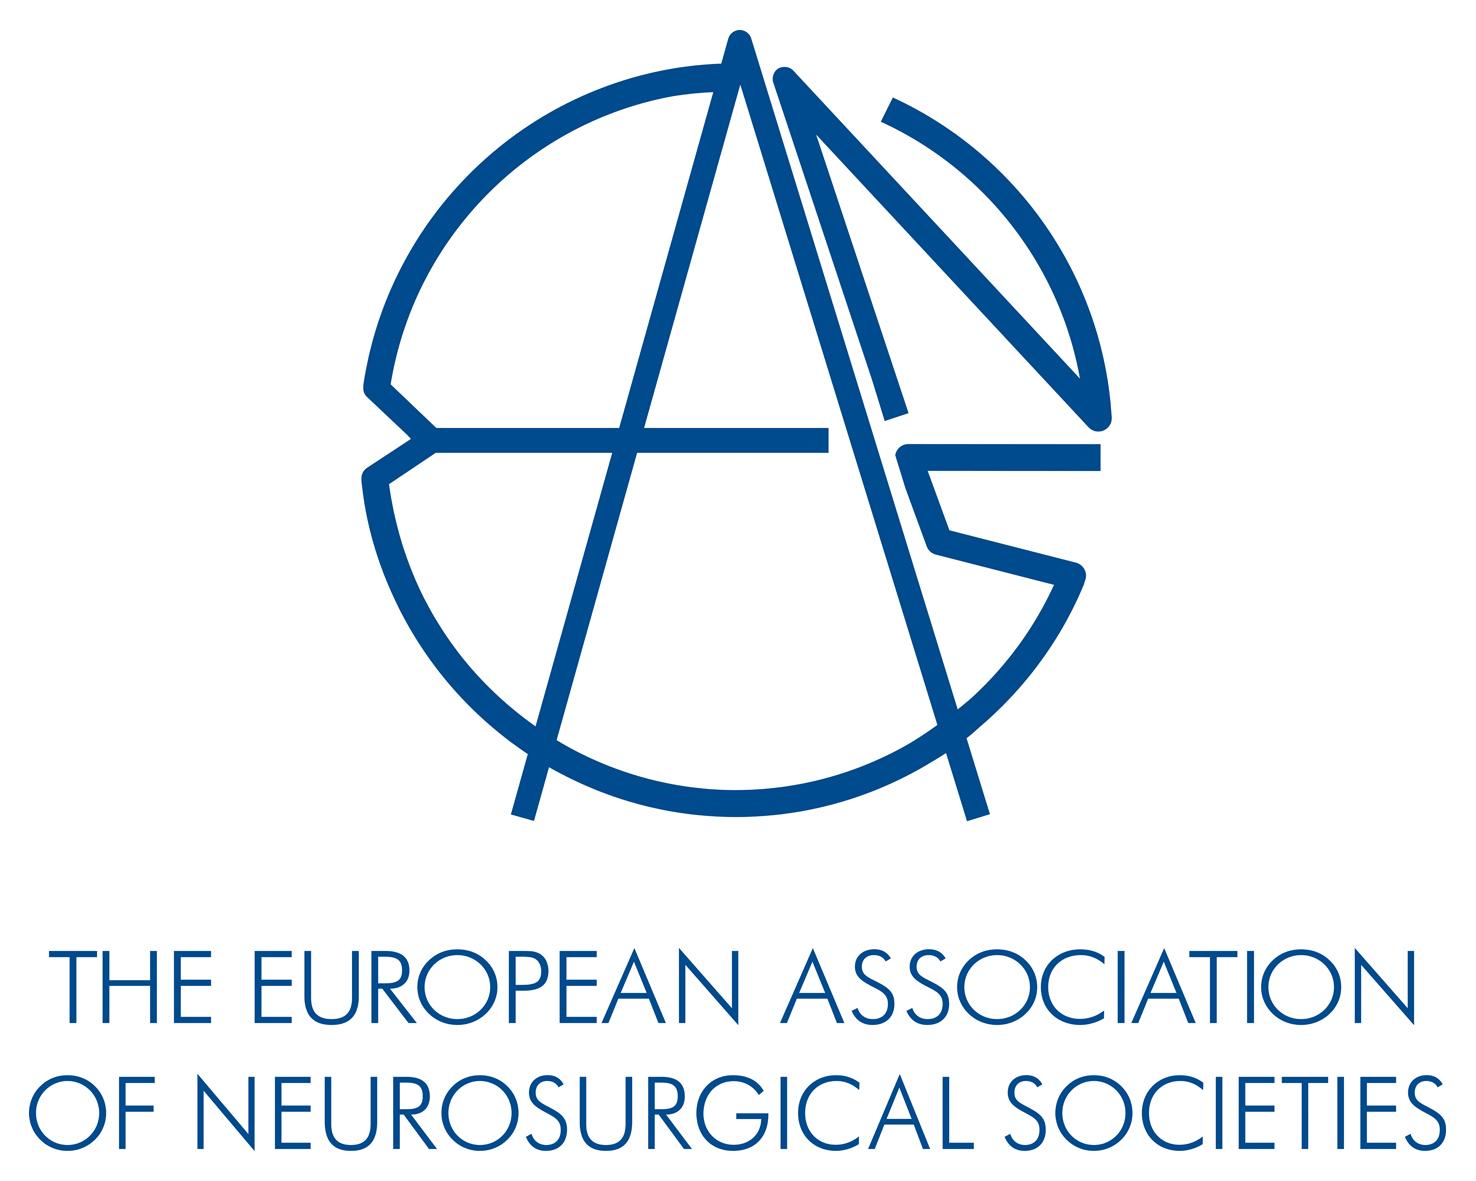 The European Association of Neurosurgical Societies